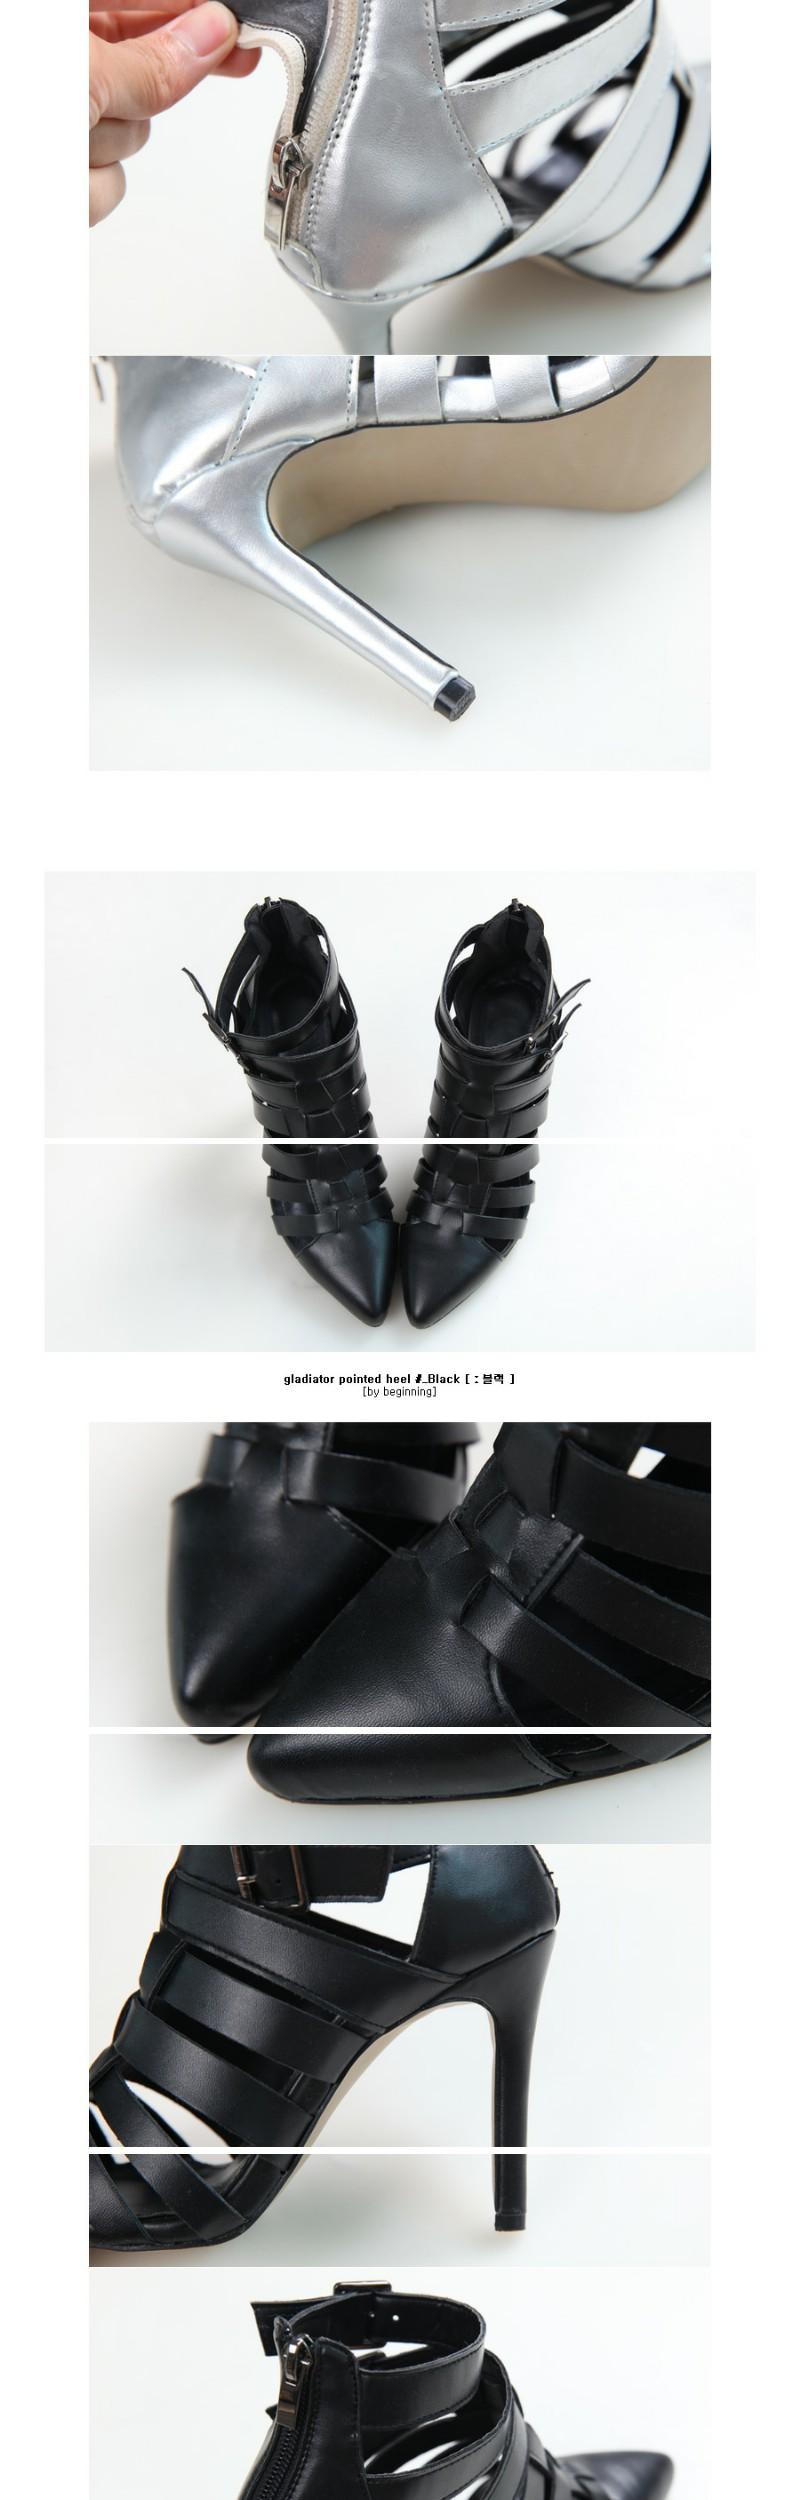 gladiator pointed heel